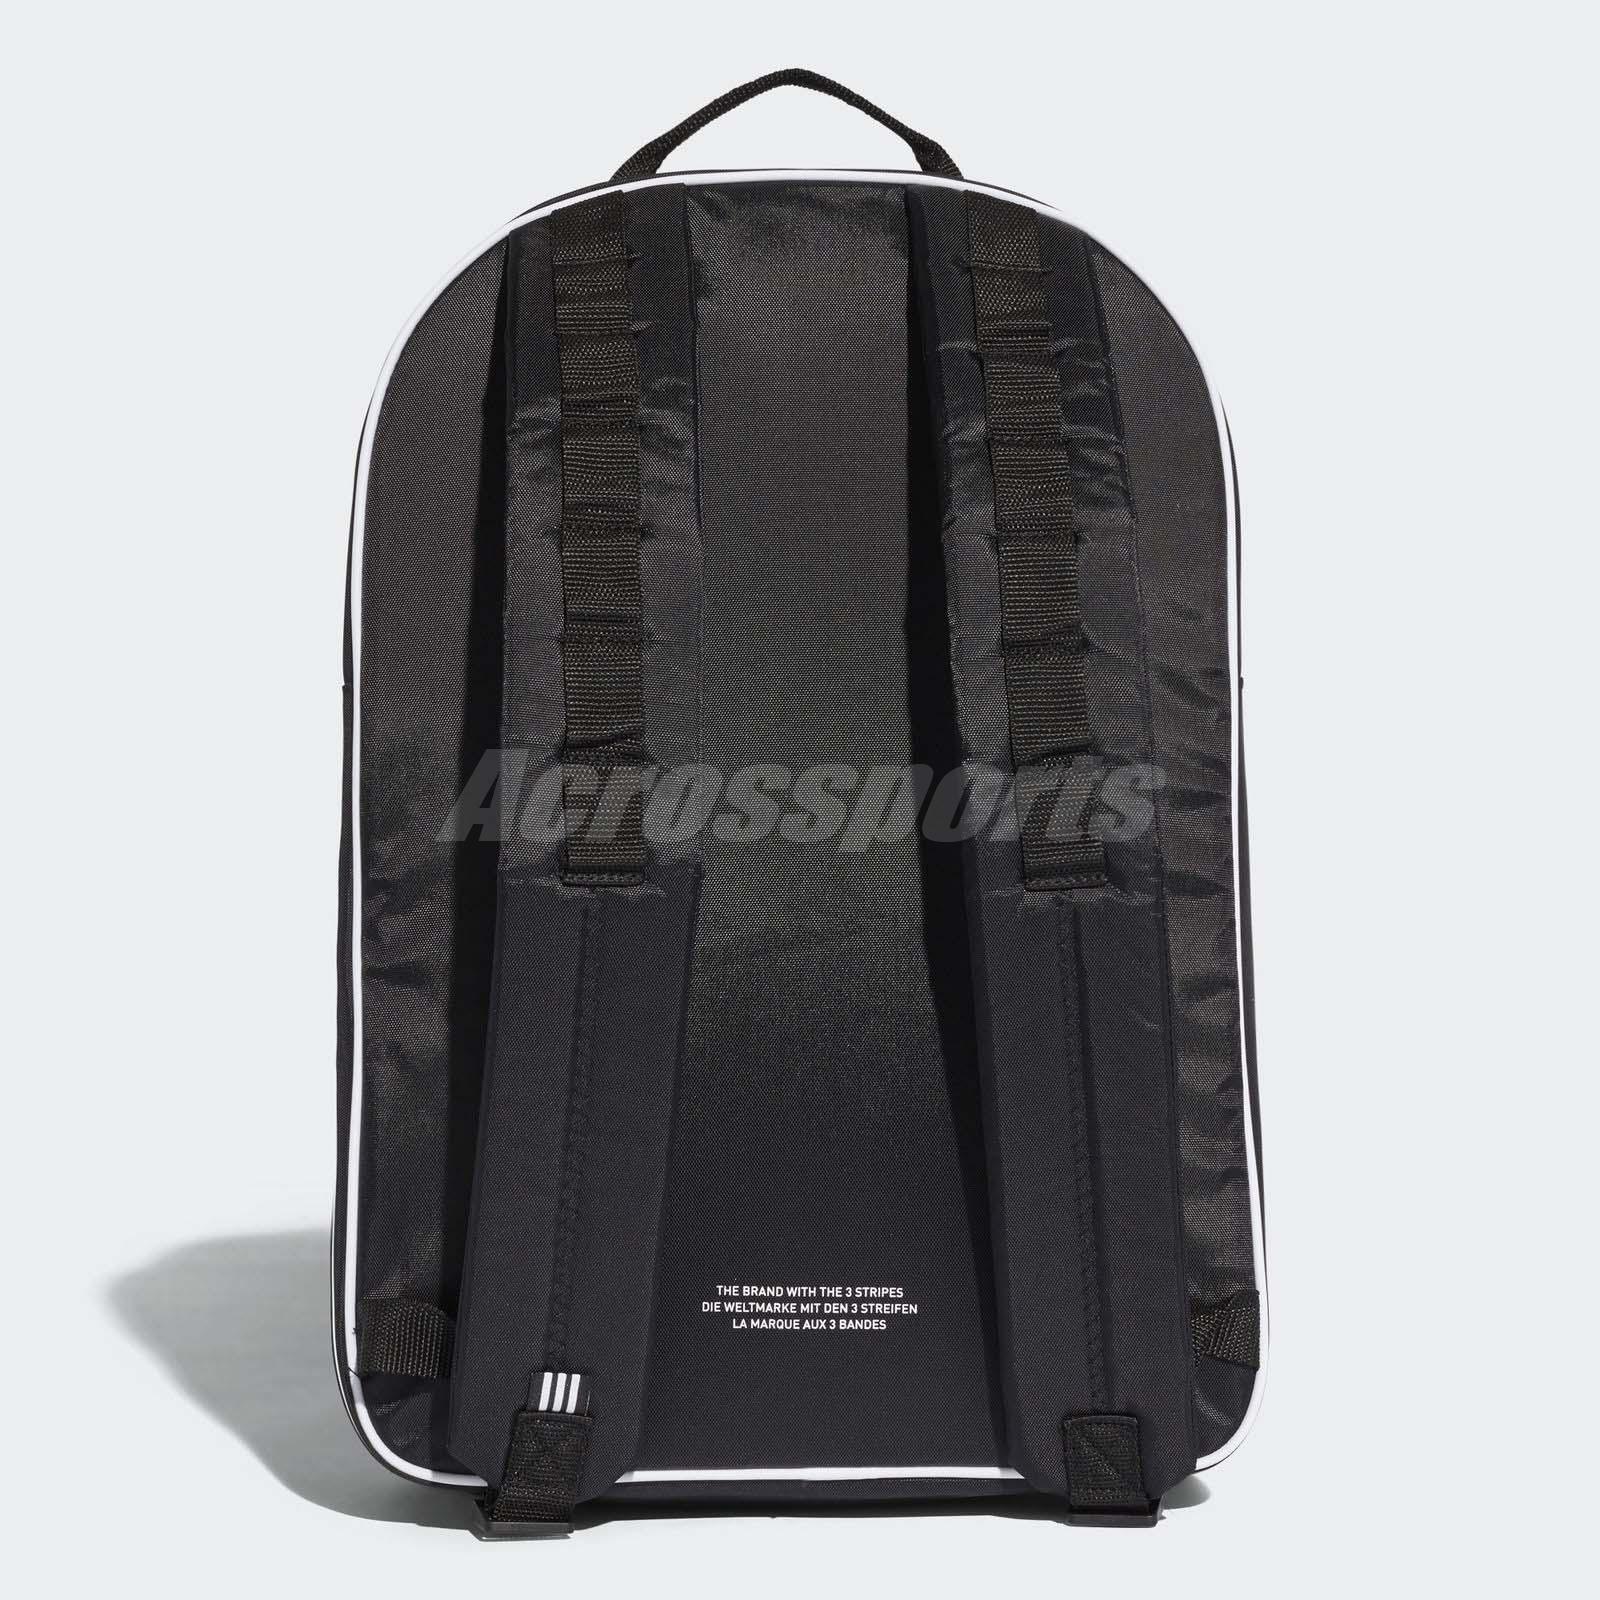 adidas Originals Unisex Originals Classic 19996 Backpack Negro Trefoil Sports Bag Negro 0136527 - grind.website